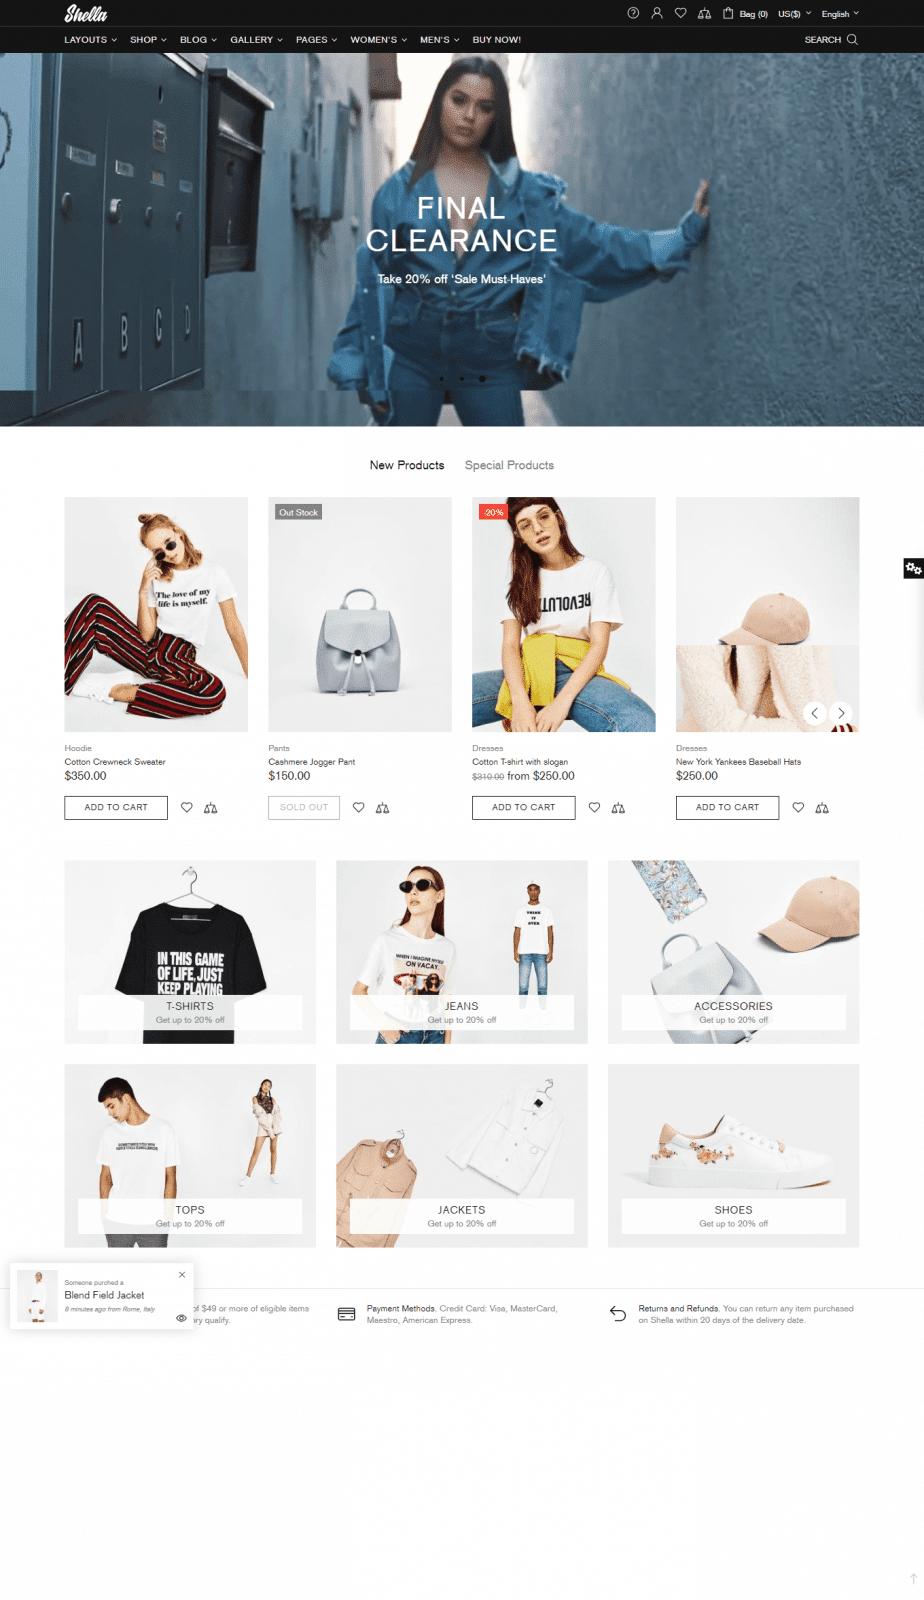 tienda virtual endagapa ecommerce